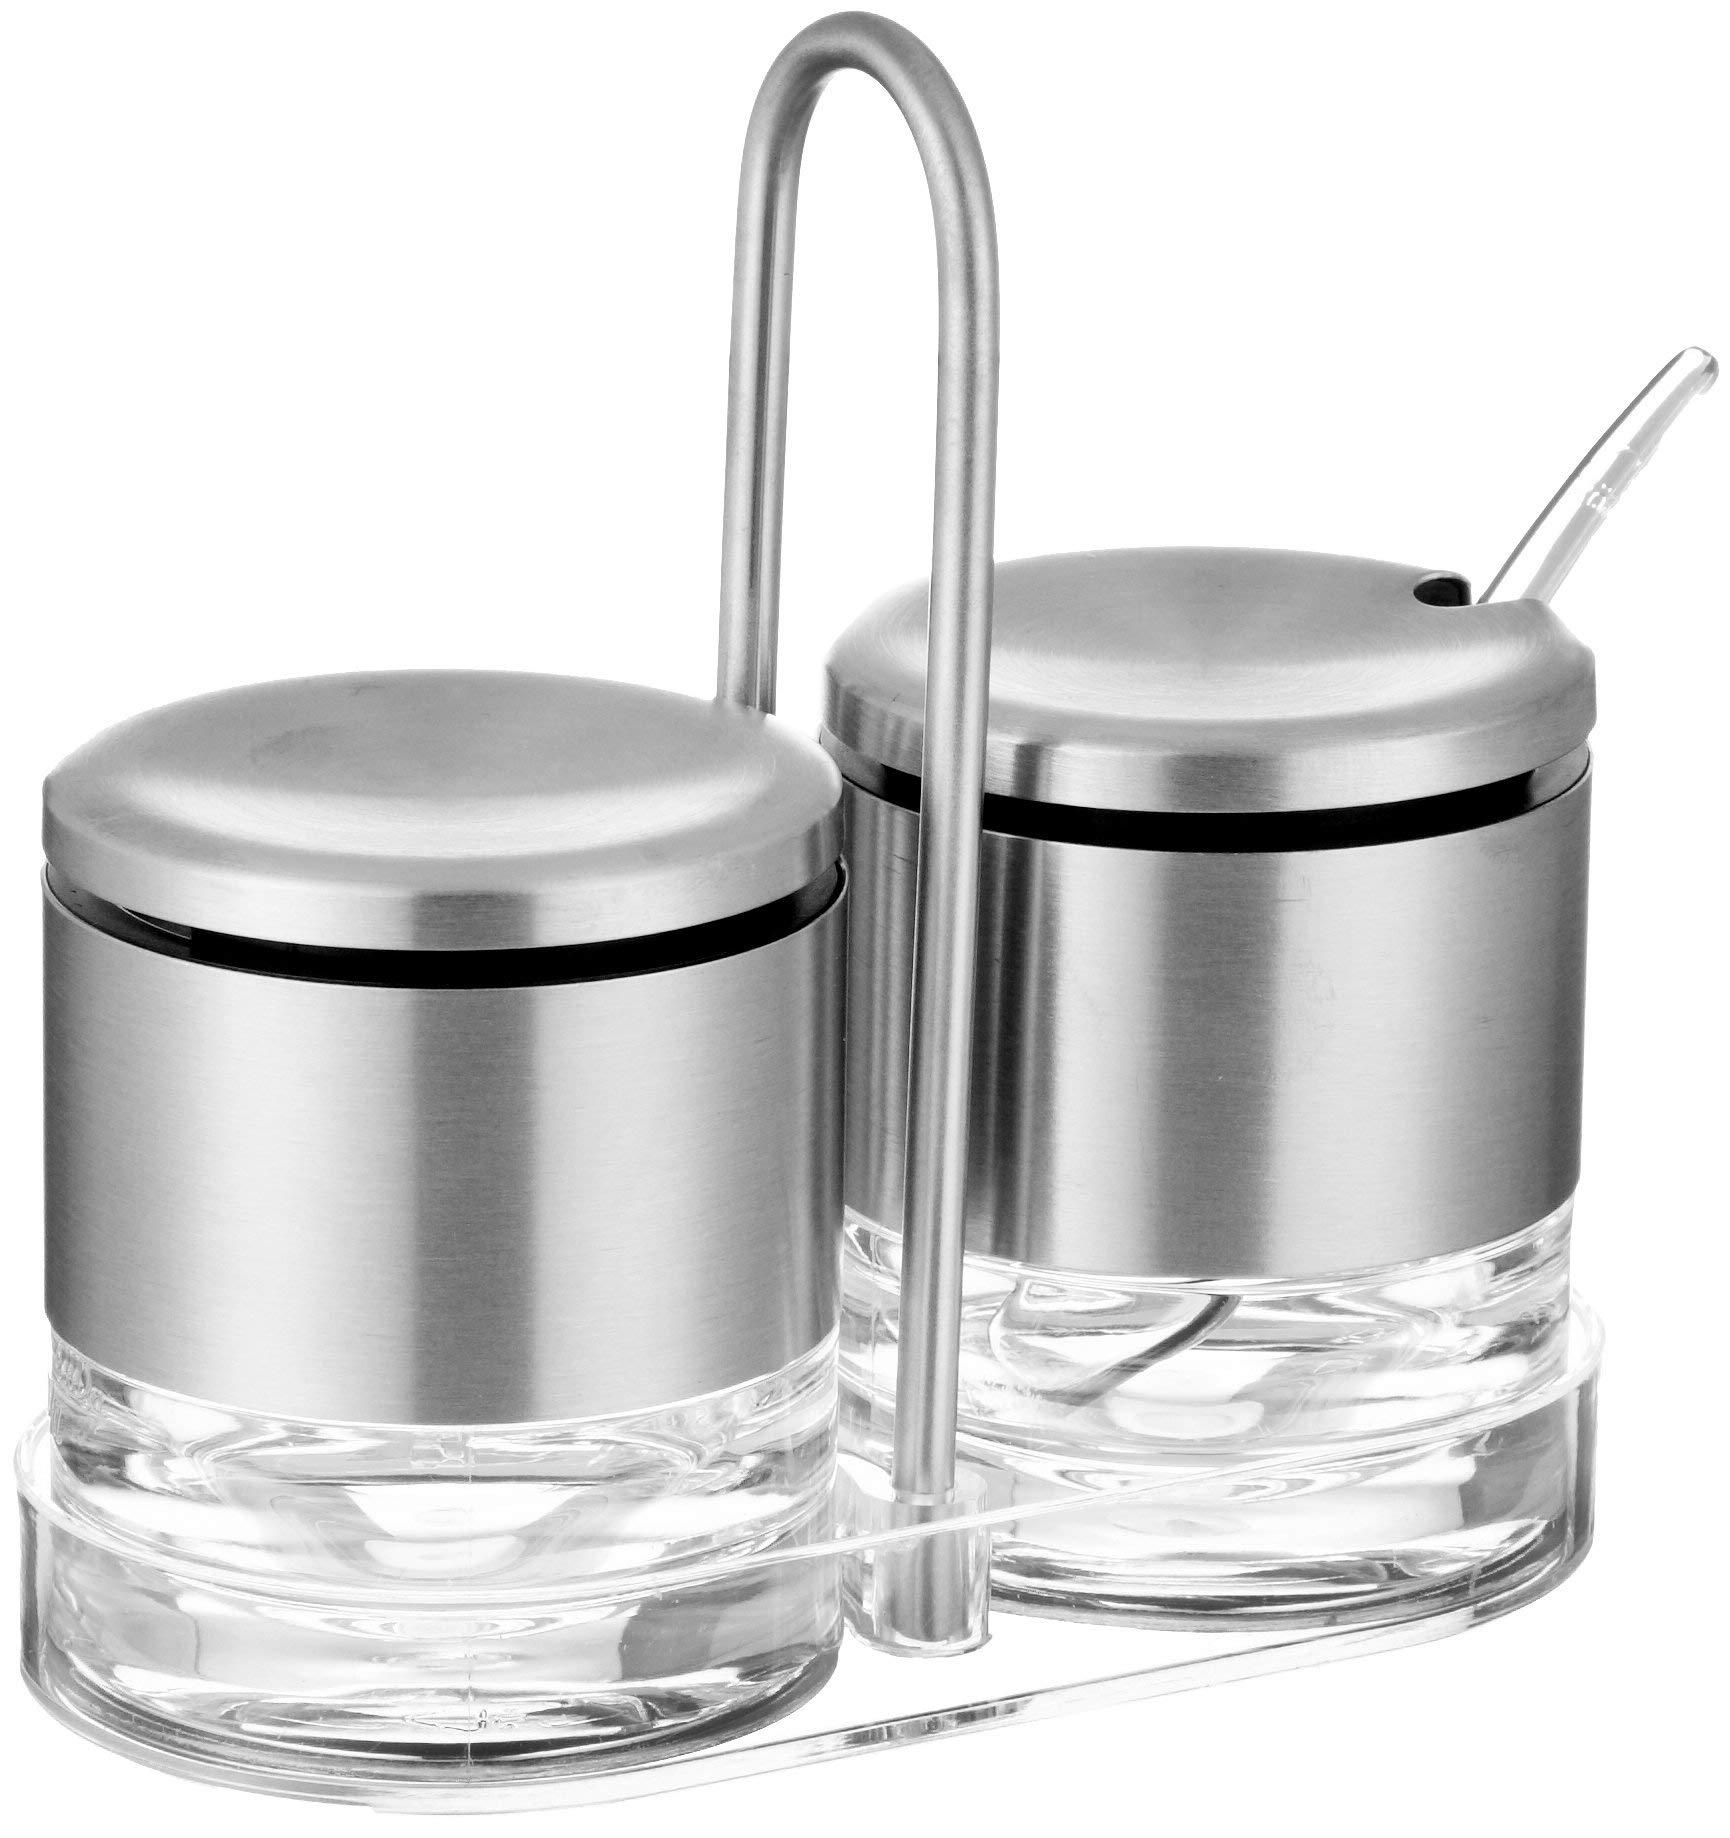 Emsa Cream Sugar Stand''Accenta'' of Stainless Steel, Silver